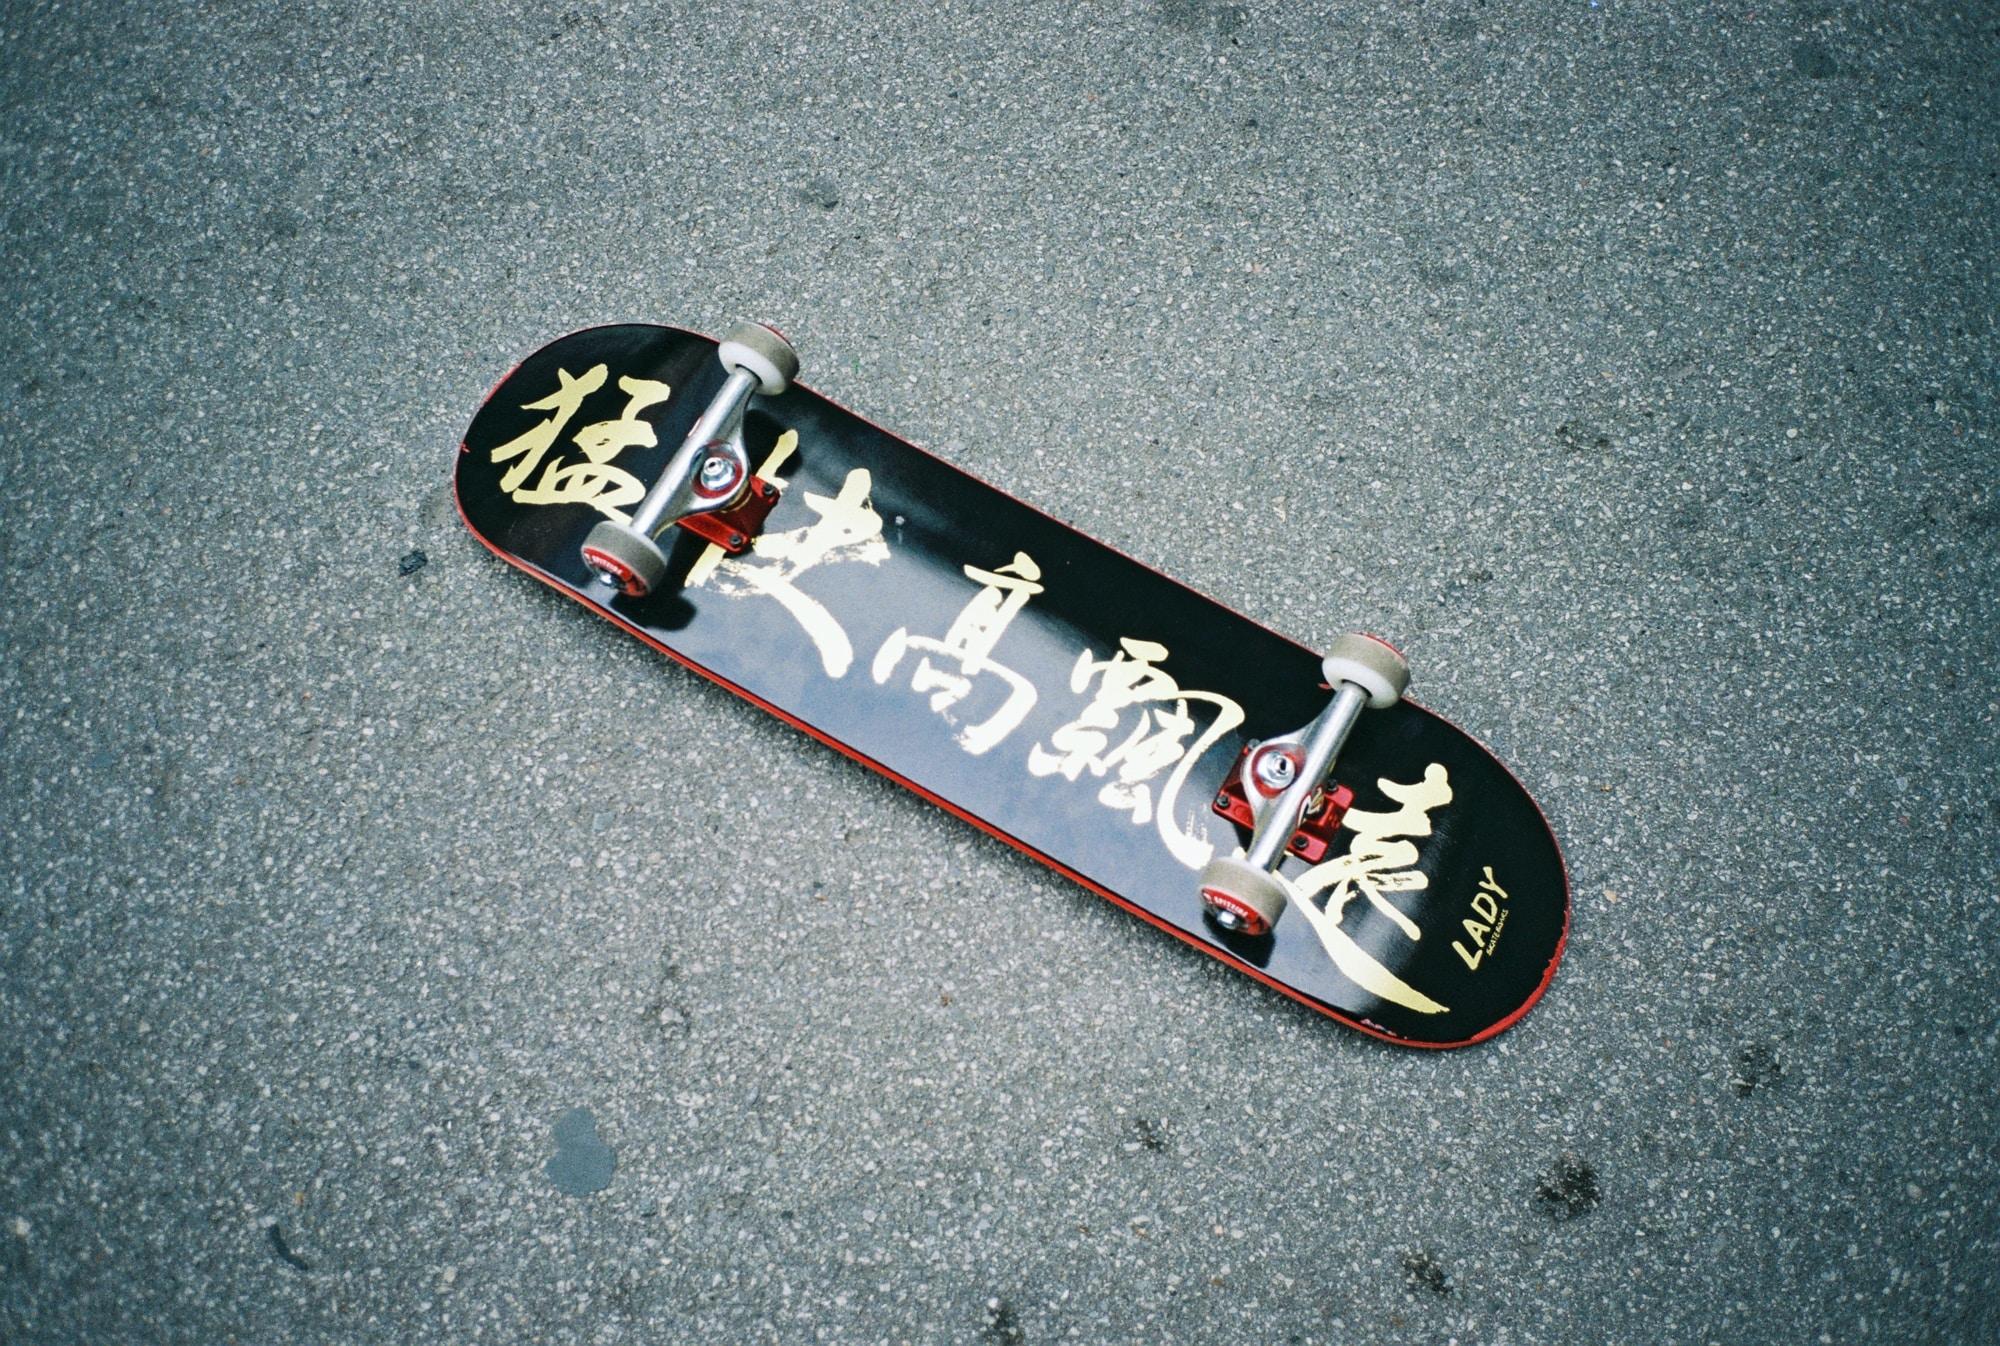 black skateboard on gray surface